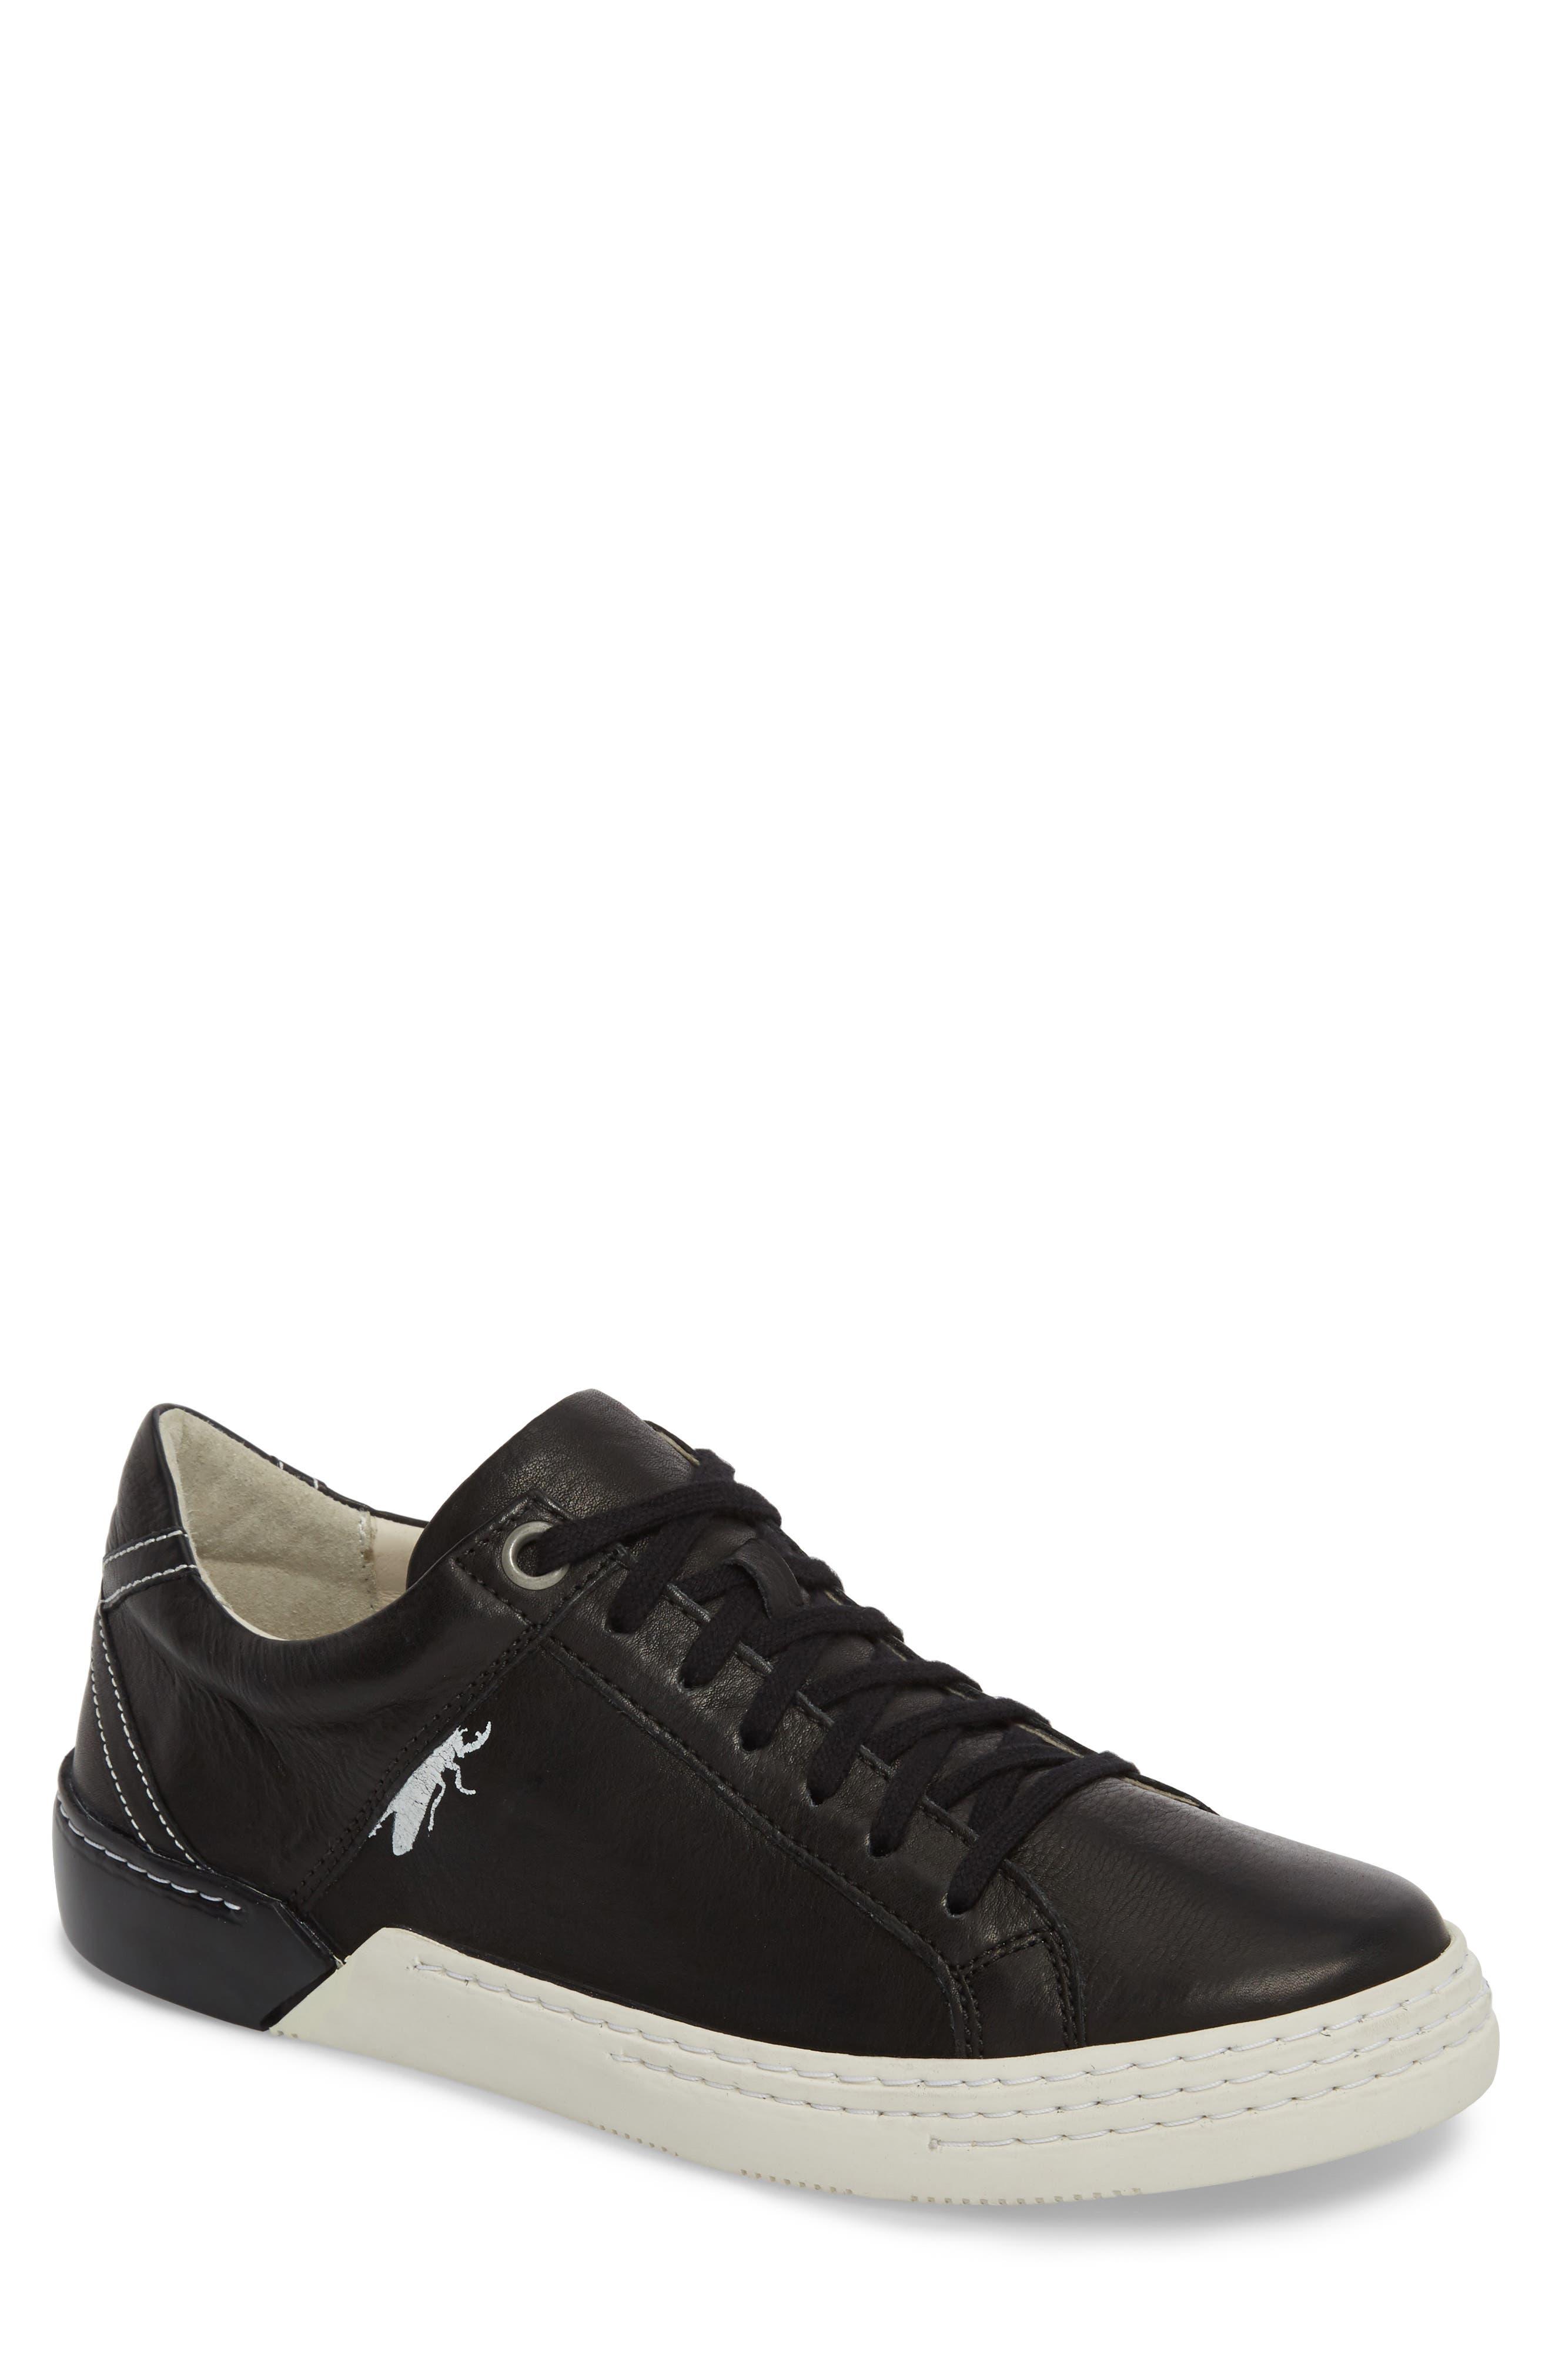 Sene Low Top Sneaker,                         Main,                         color, BLACK LEATHER